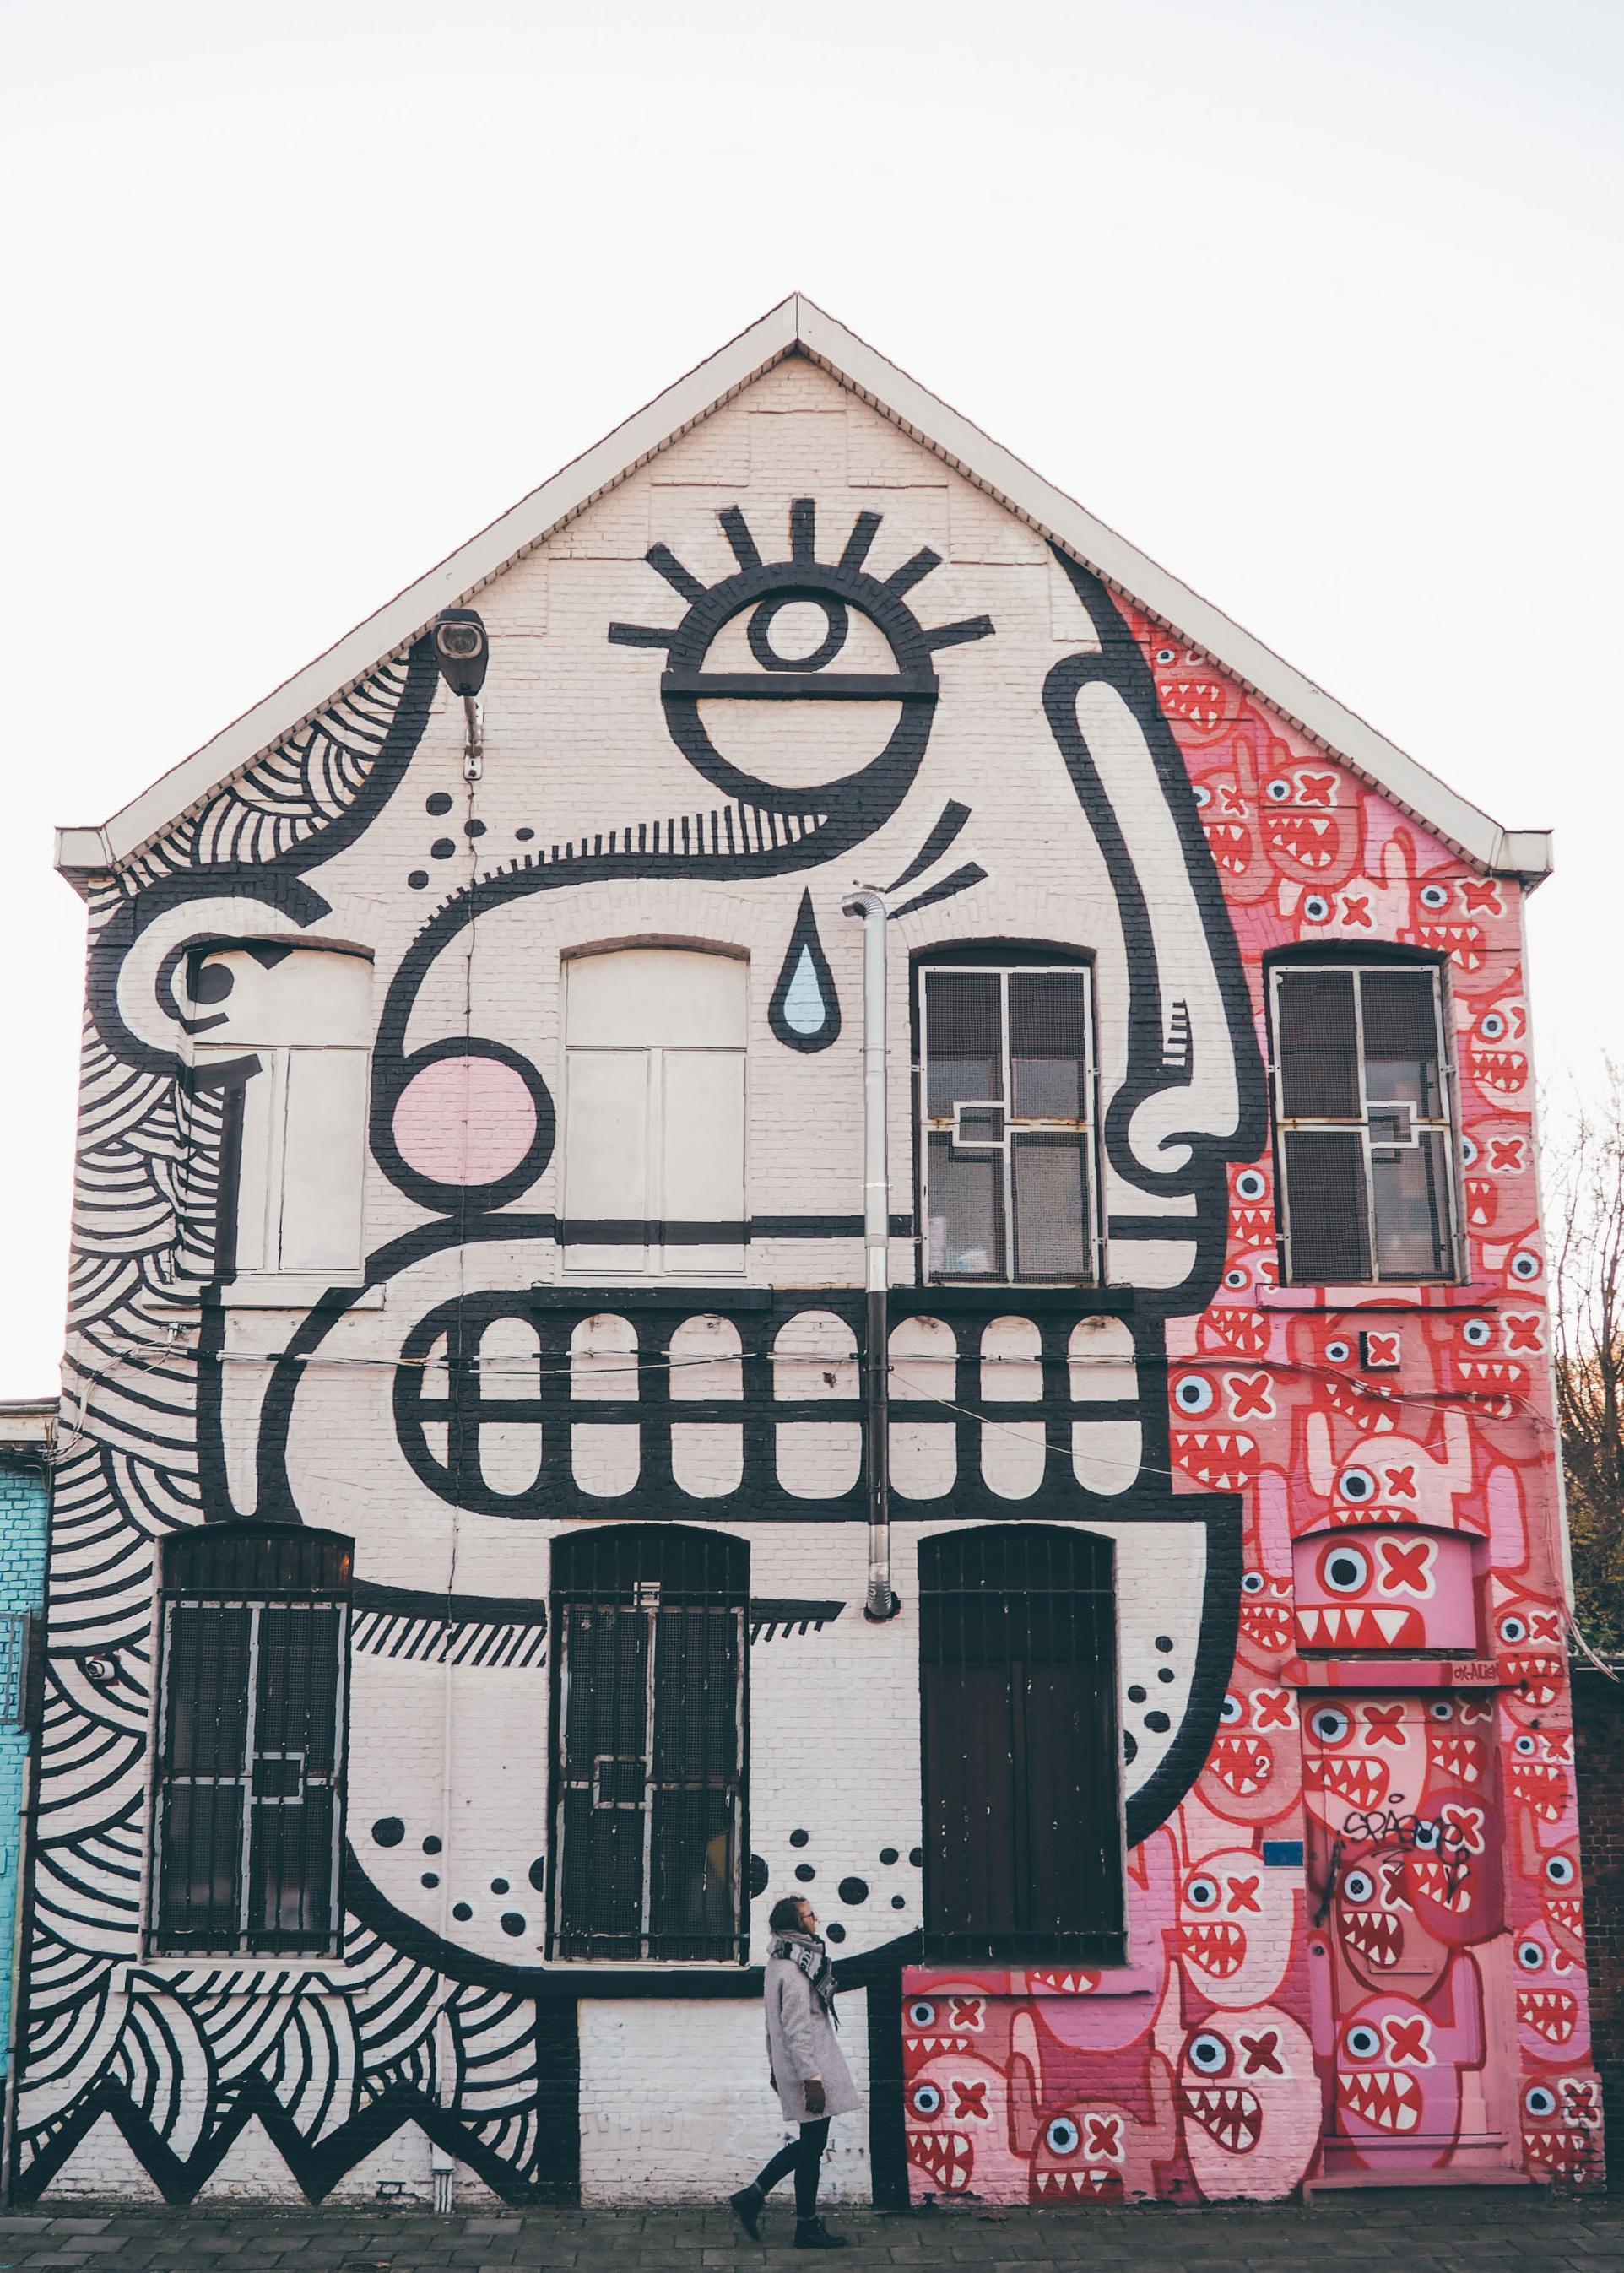 Anvers City Guide / Tippy.fr. Balade street art dans le quartier Zurenborg d'Anvers : Krugerstraat & Minkelersstraat !